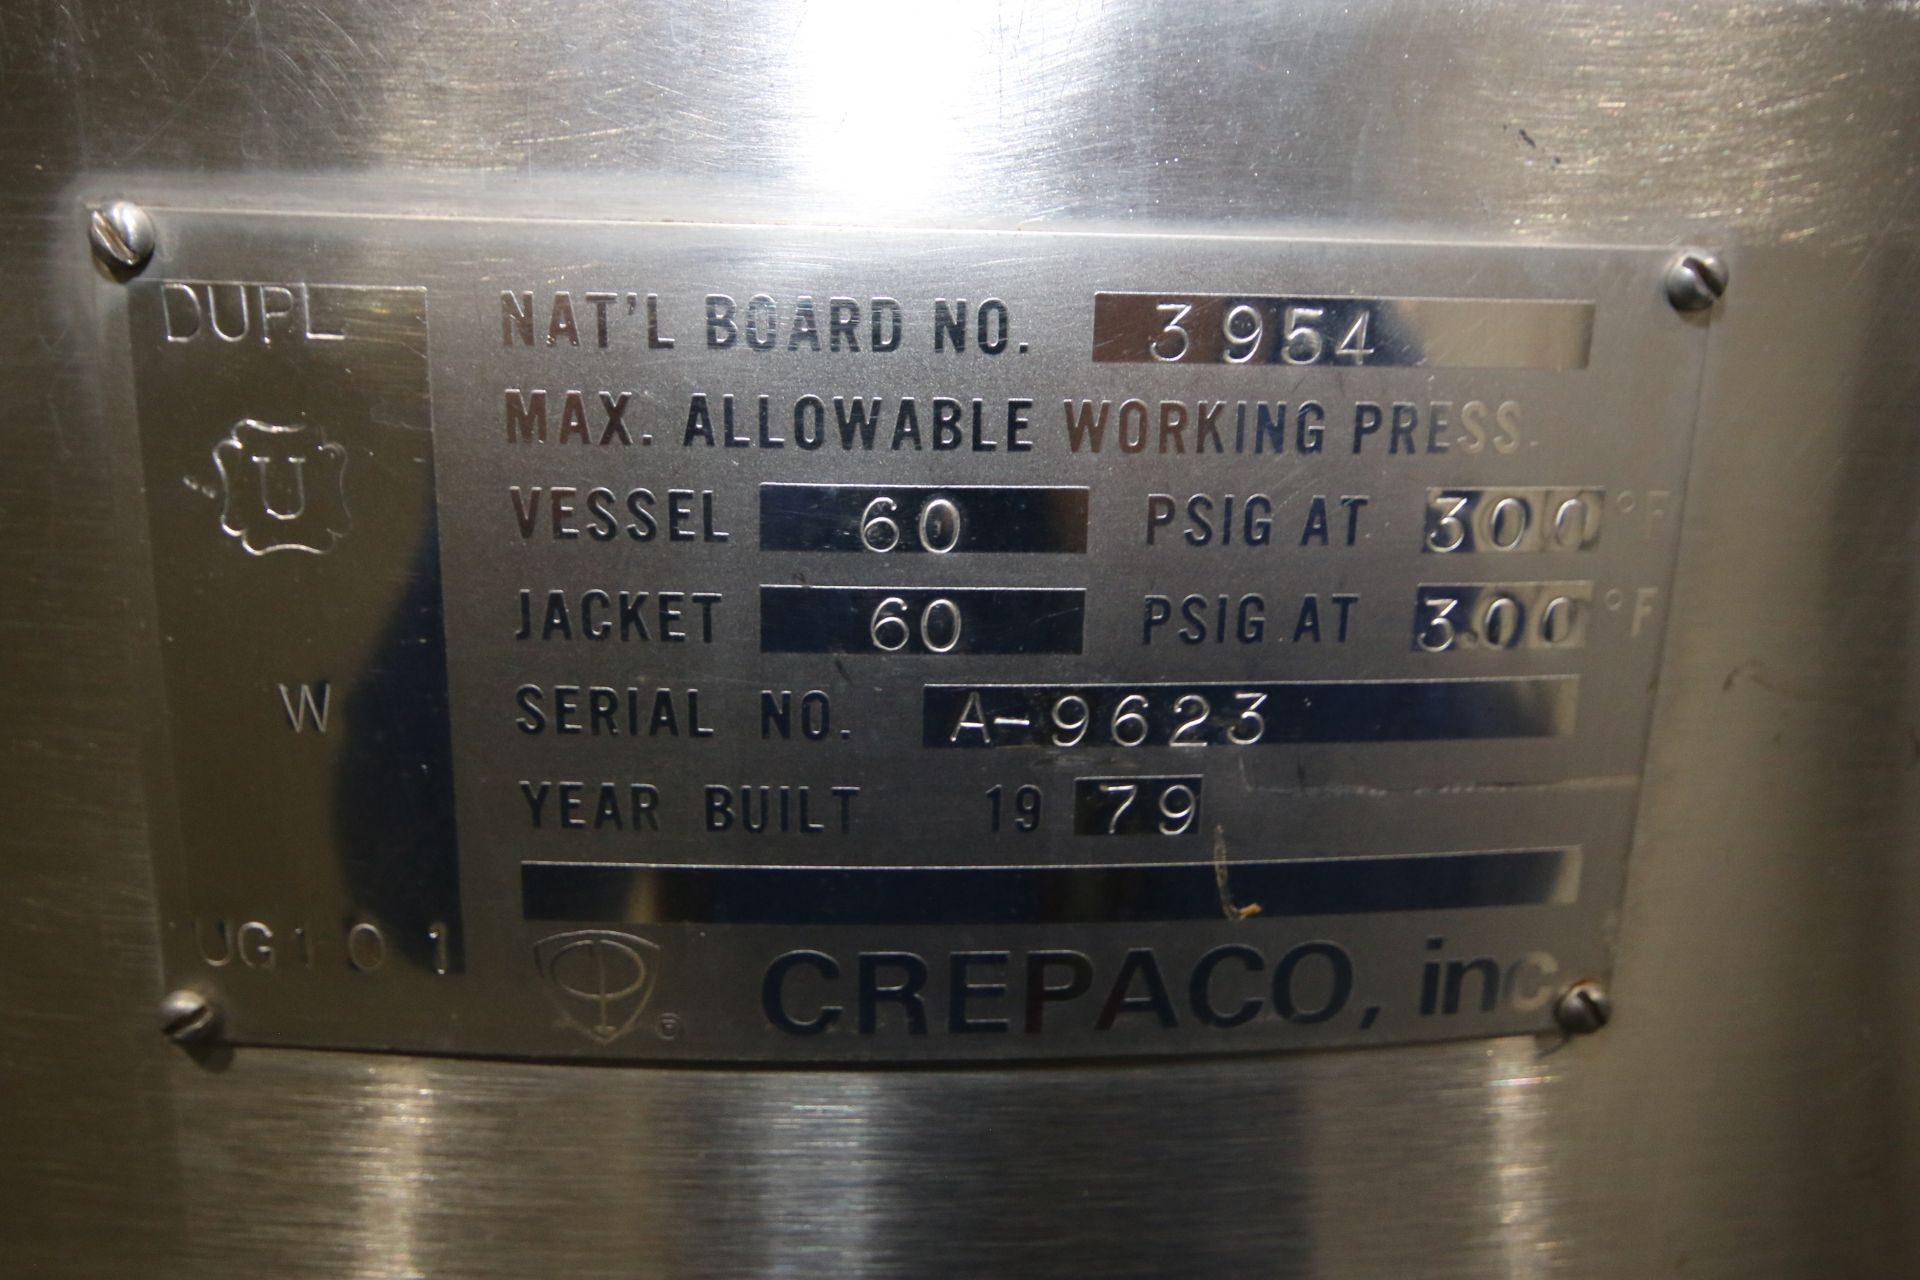 Lot 26 - Crepaco Aprox. 150 Gal. S/S Processor, S/N A-9623, NAT'L BD: 3954, Max. Allowable Working Press.: